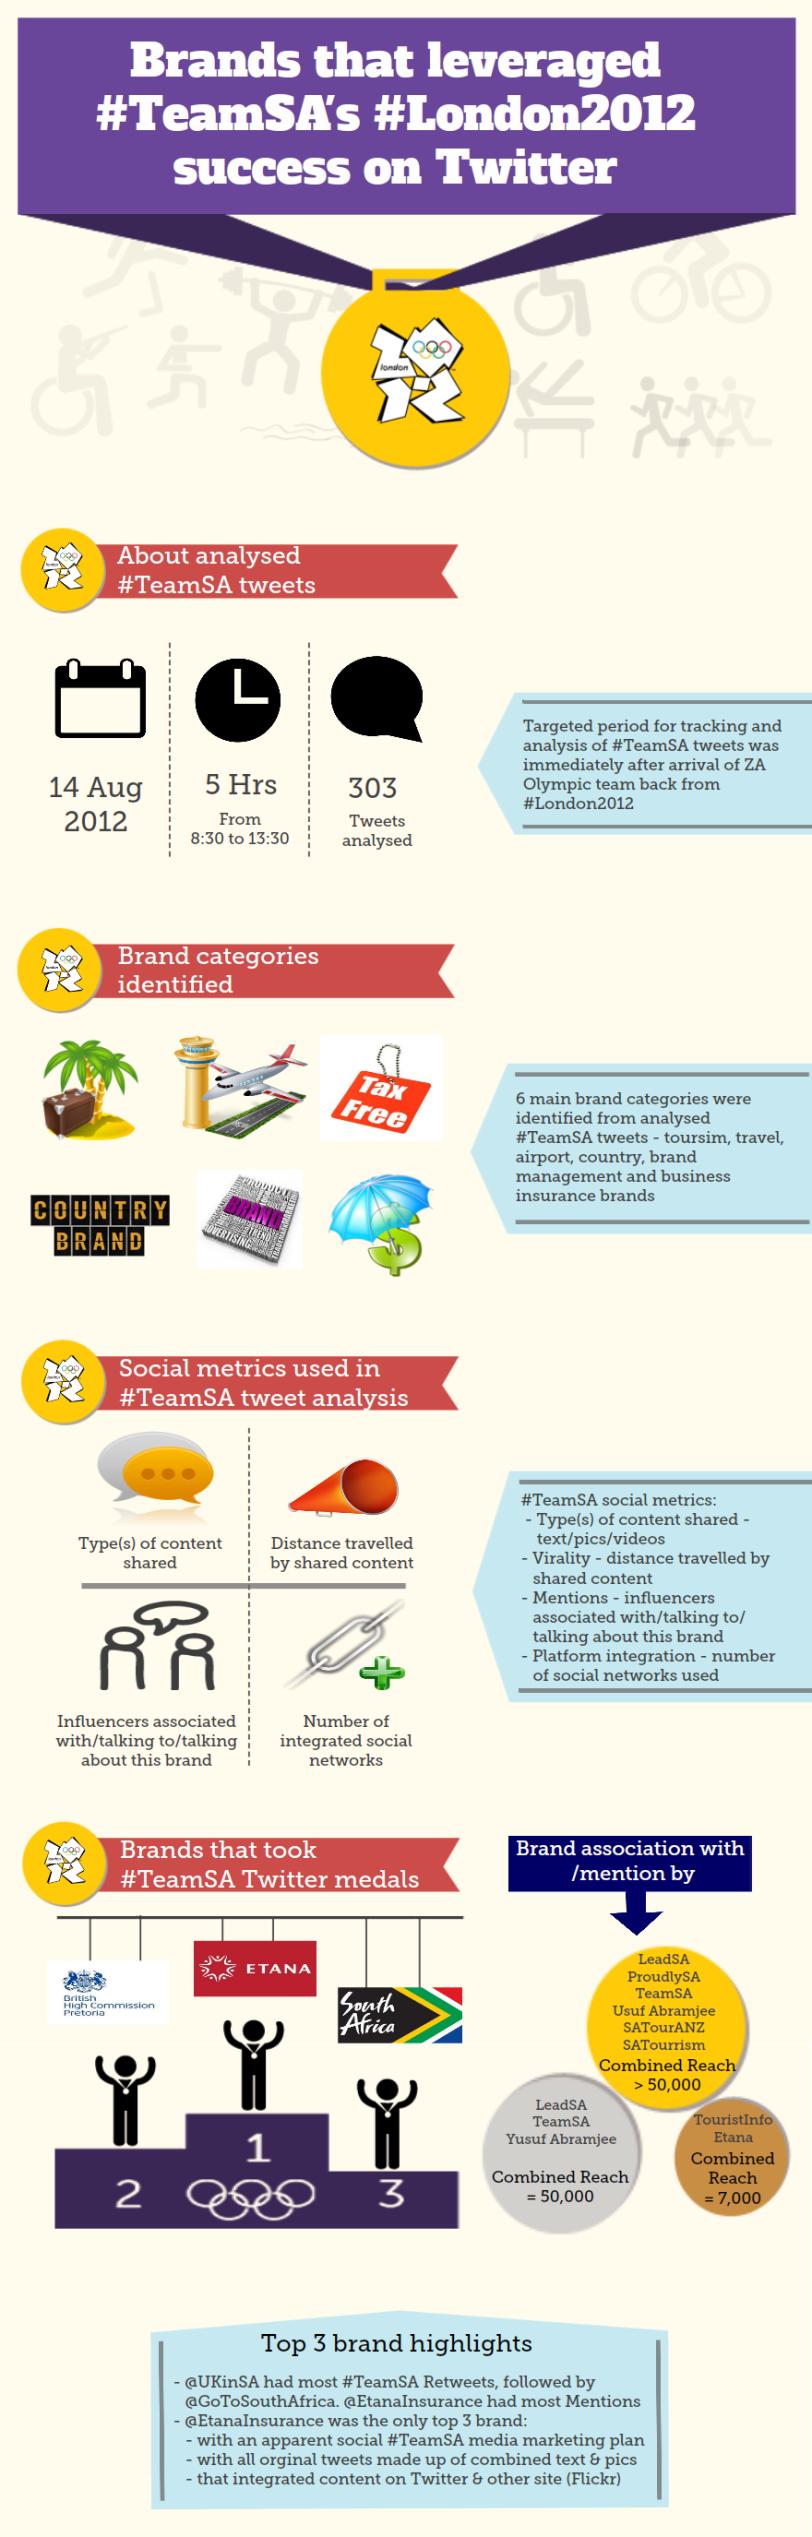 "<img src=""#TeamSA-Infographic.png"" alt=""TeamSA Infographic"" />"